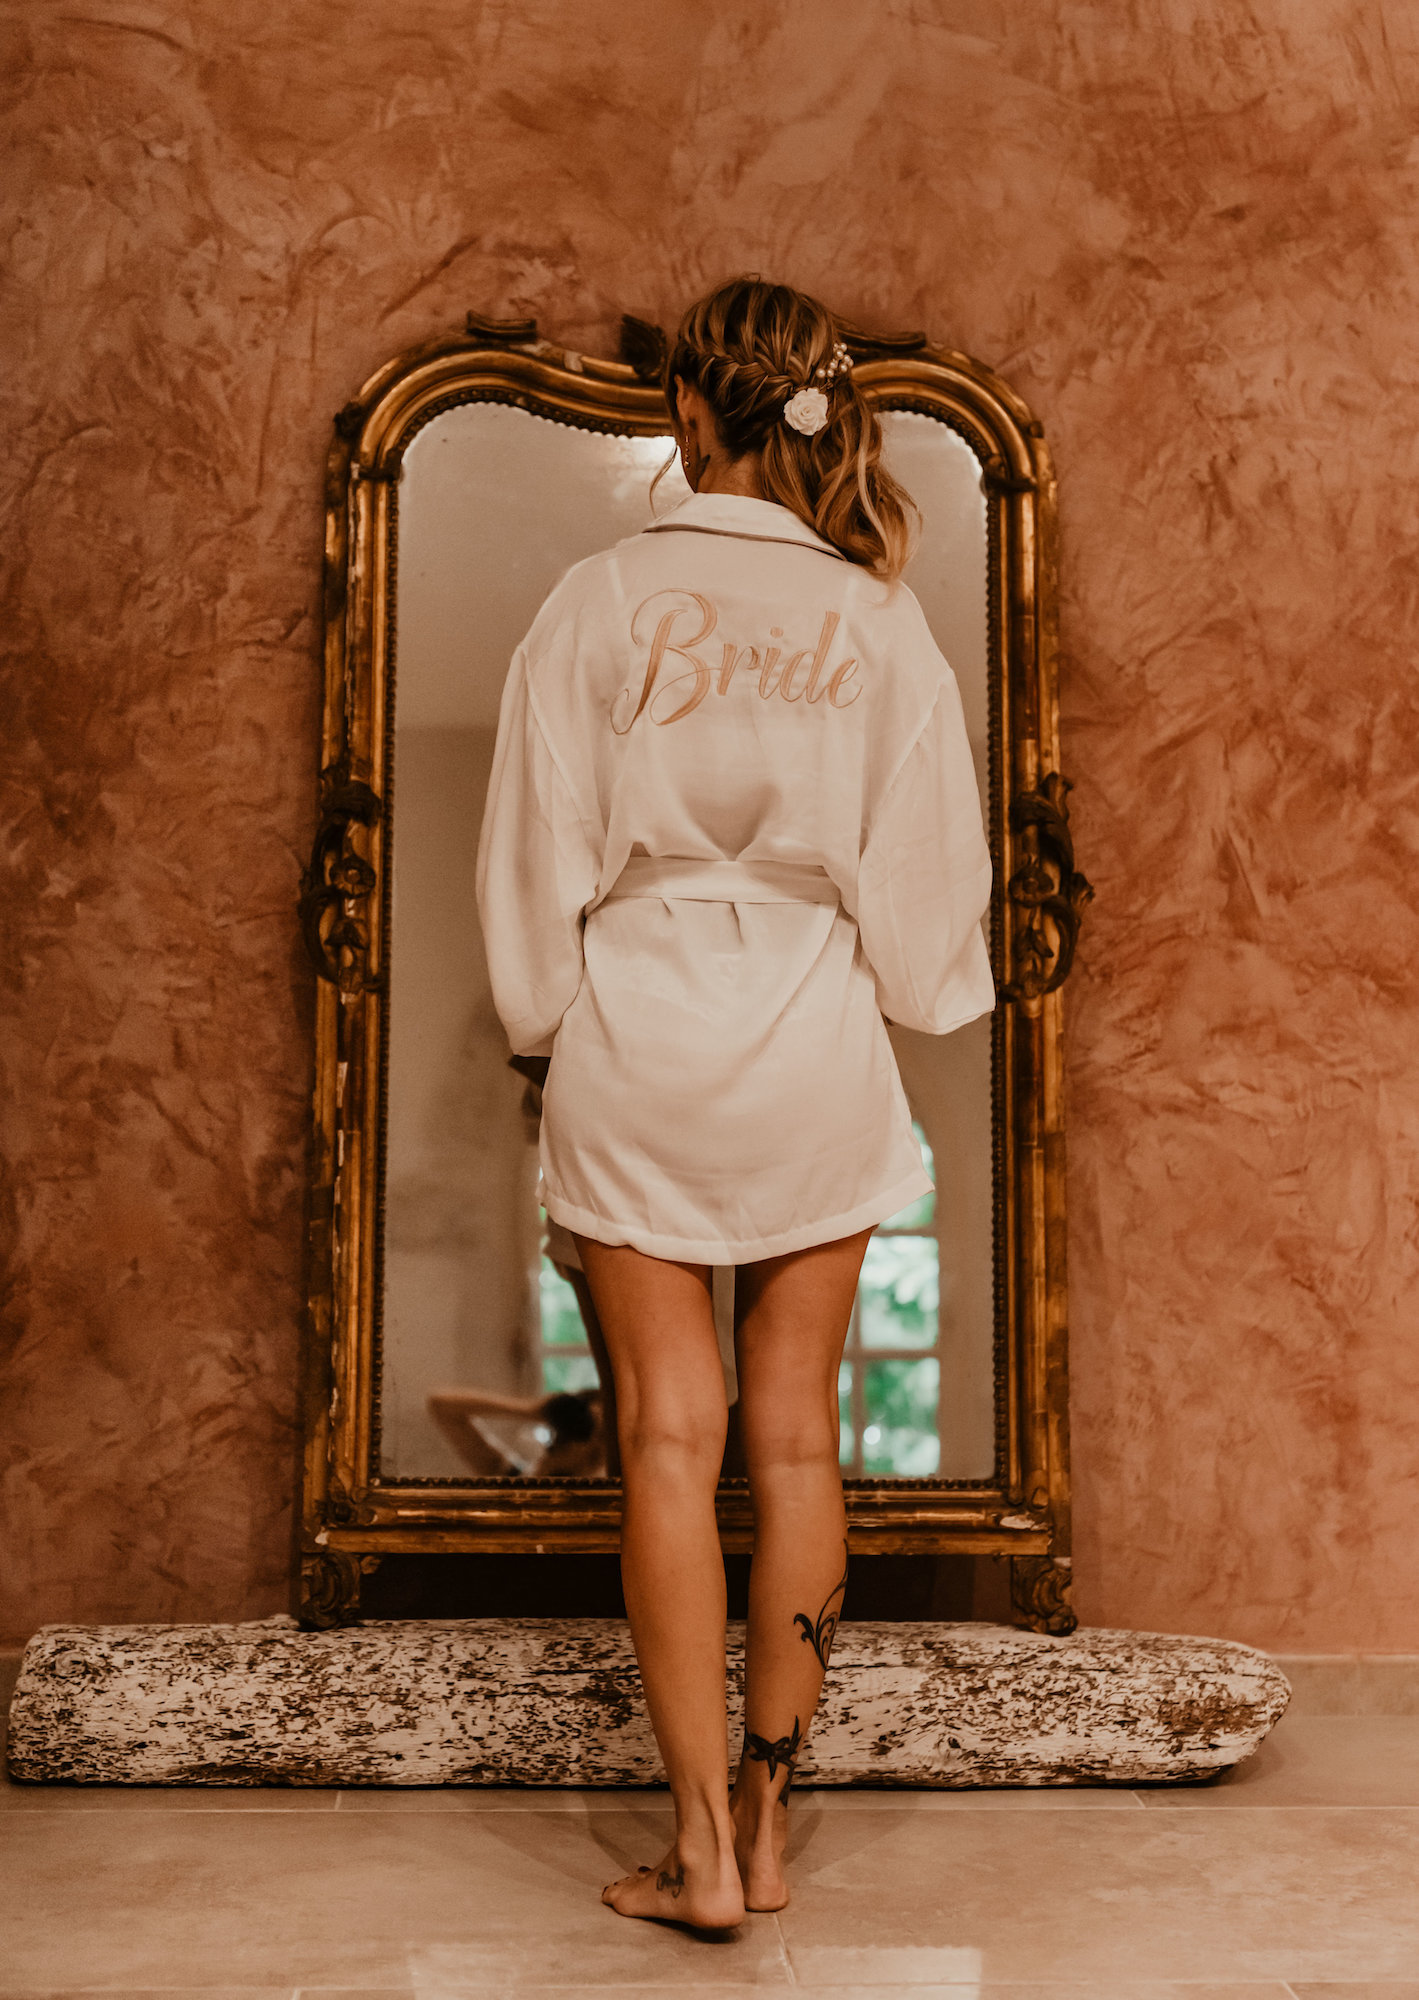 le coeur dans les etoiles - wedding planner - provence - luberon - alpilles - organisation - mariage - wedding - florine jeannot - preparatifs mariee